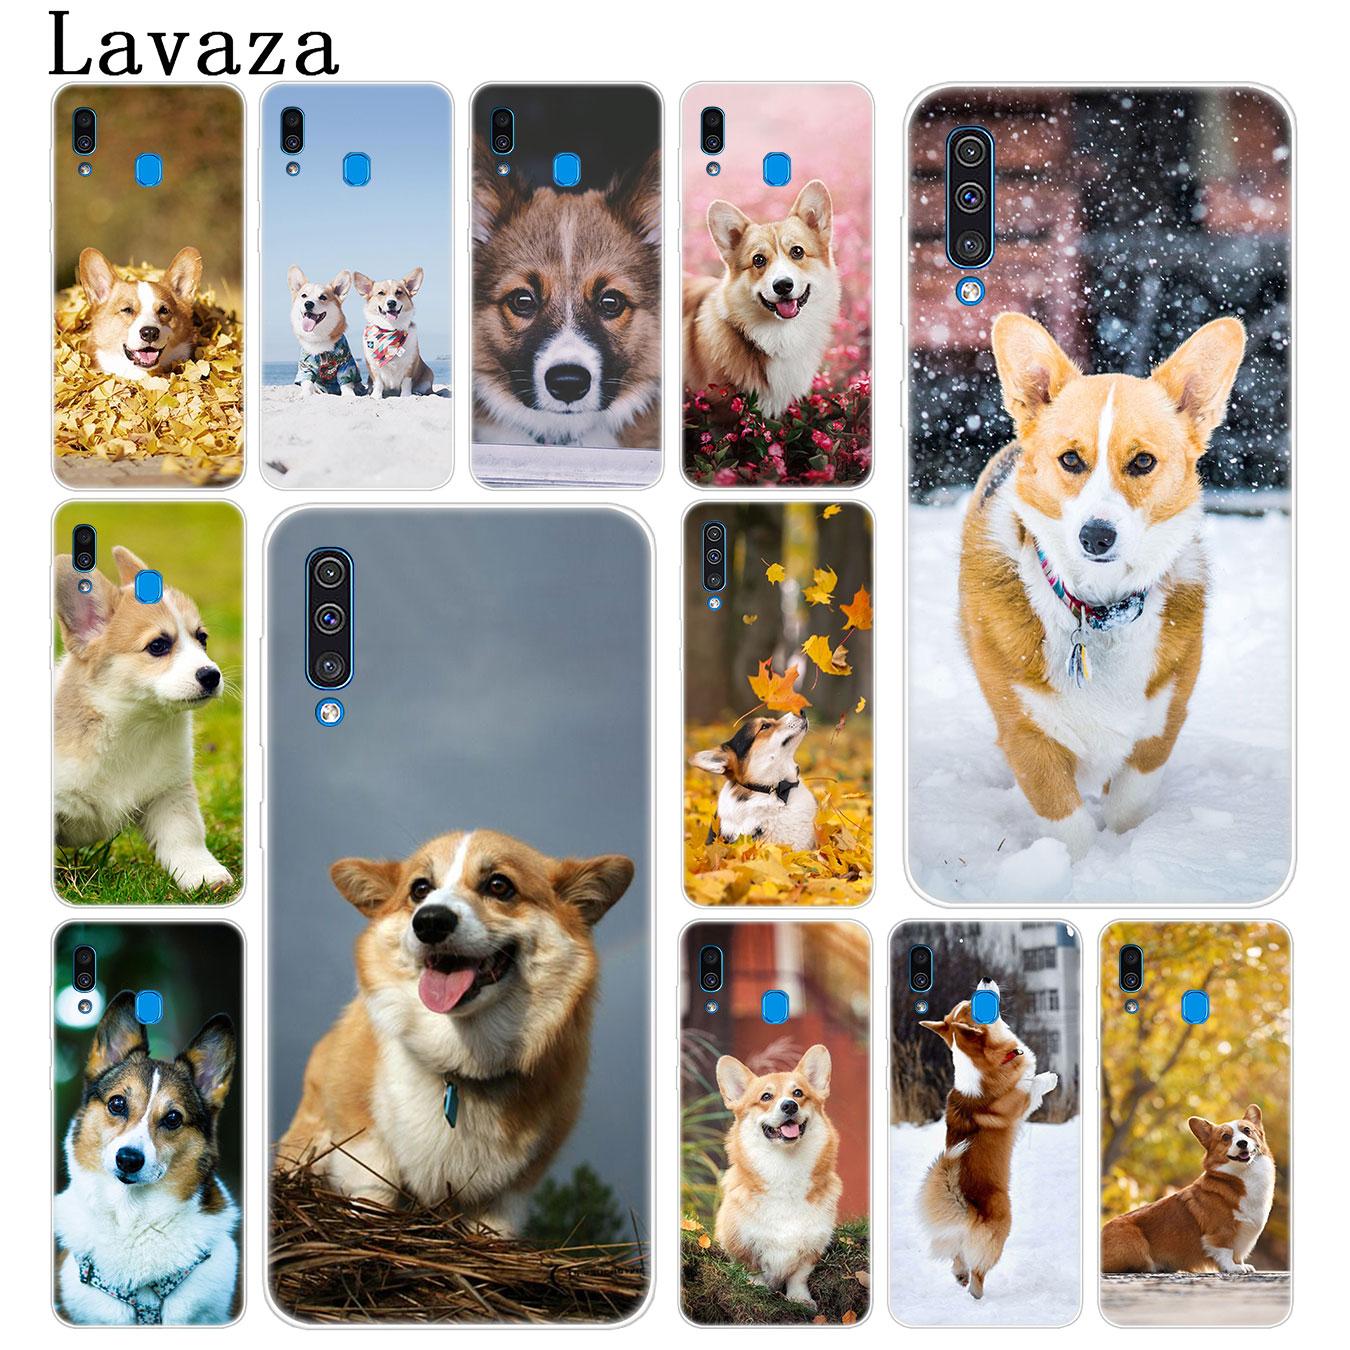 Brave Lavaza Corgi Hard Transparent Phone Case For Samsung Galaxy A70 A50 A40 A30 A10 M10 M20 M30 Cove Easy To Lubricate